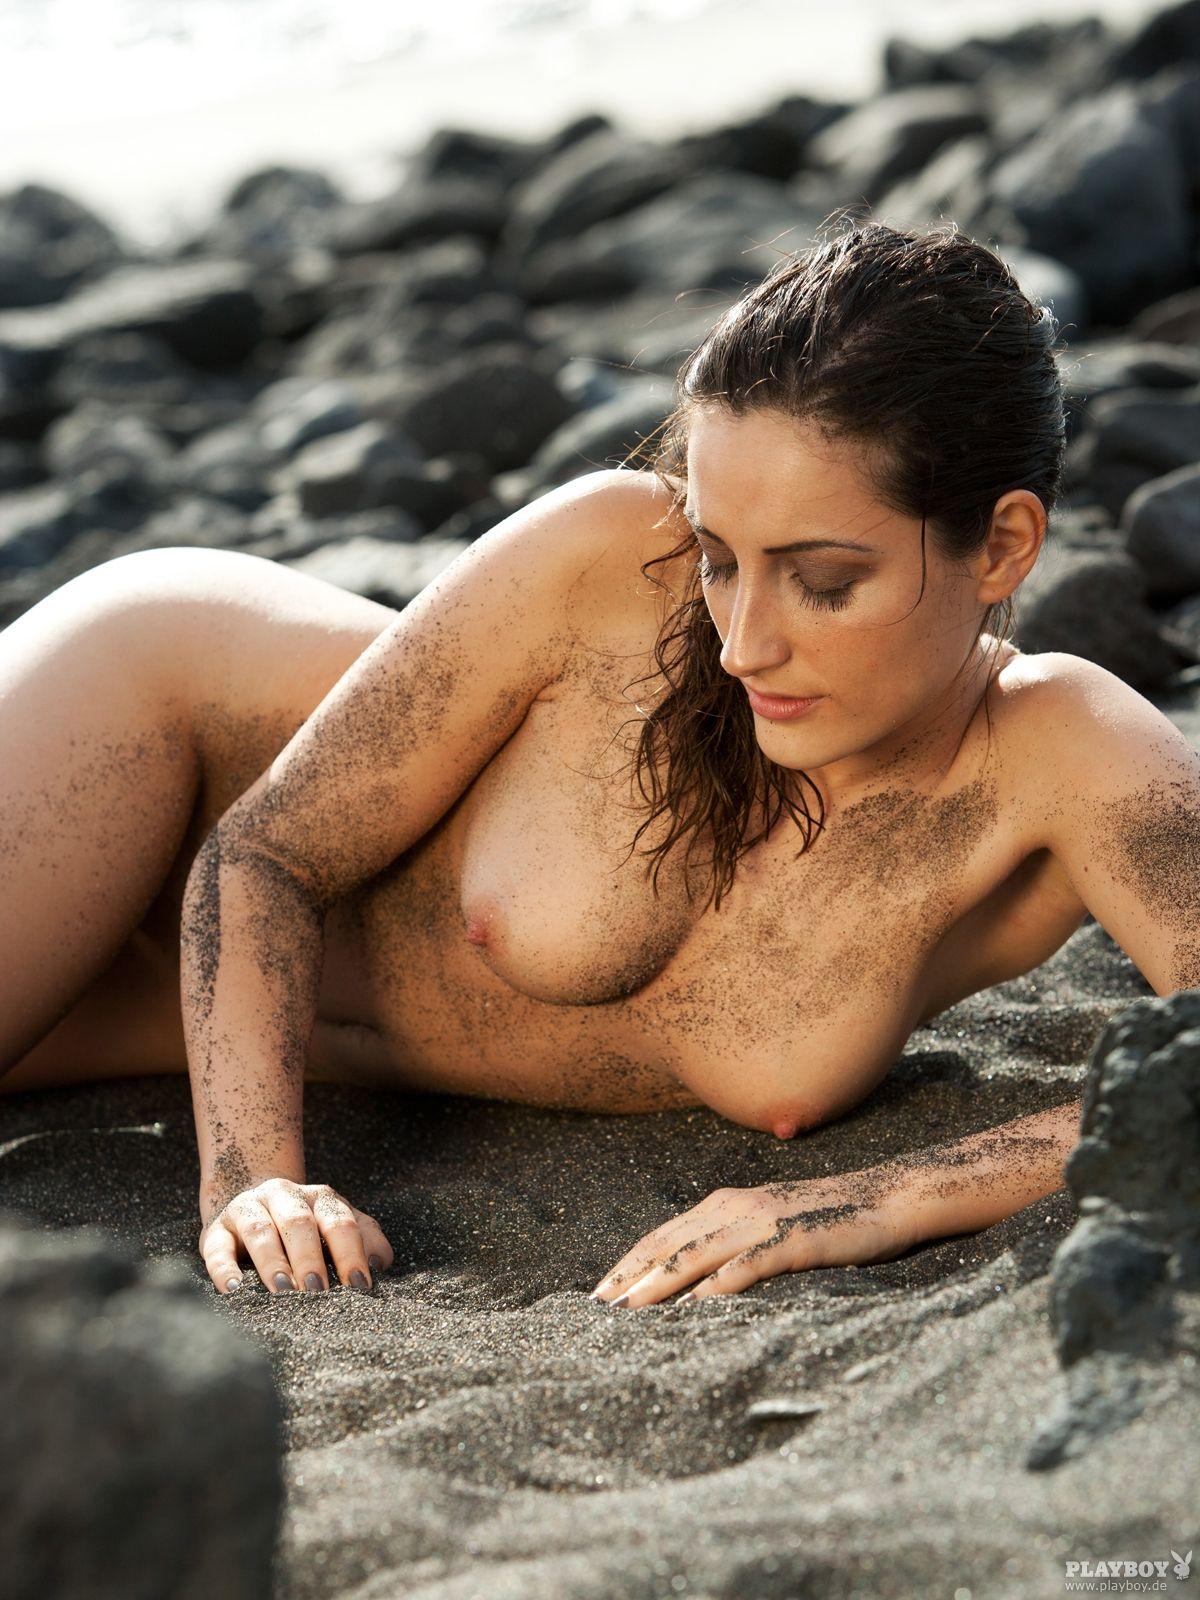 Турецкий порно актер сахин уилмаз 24 фотография